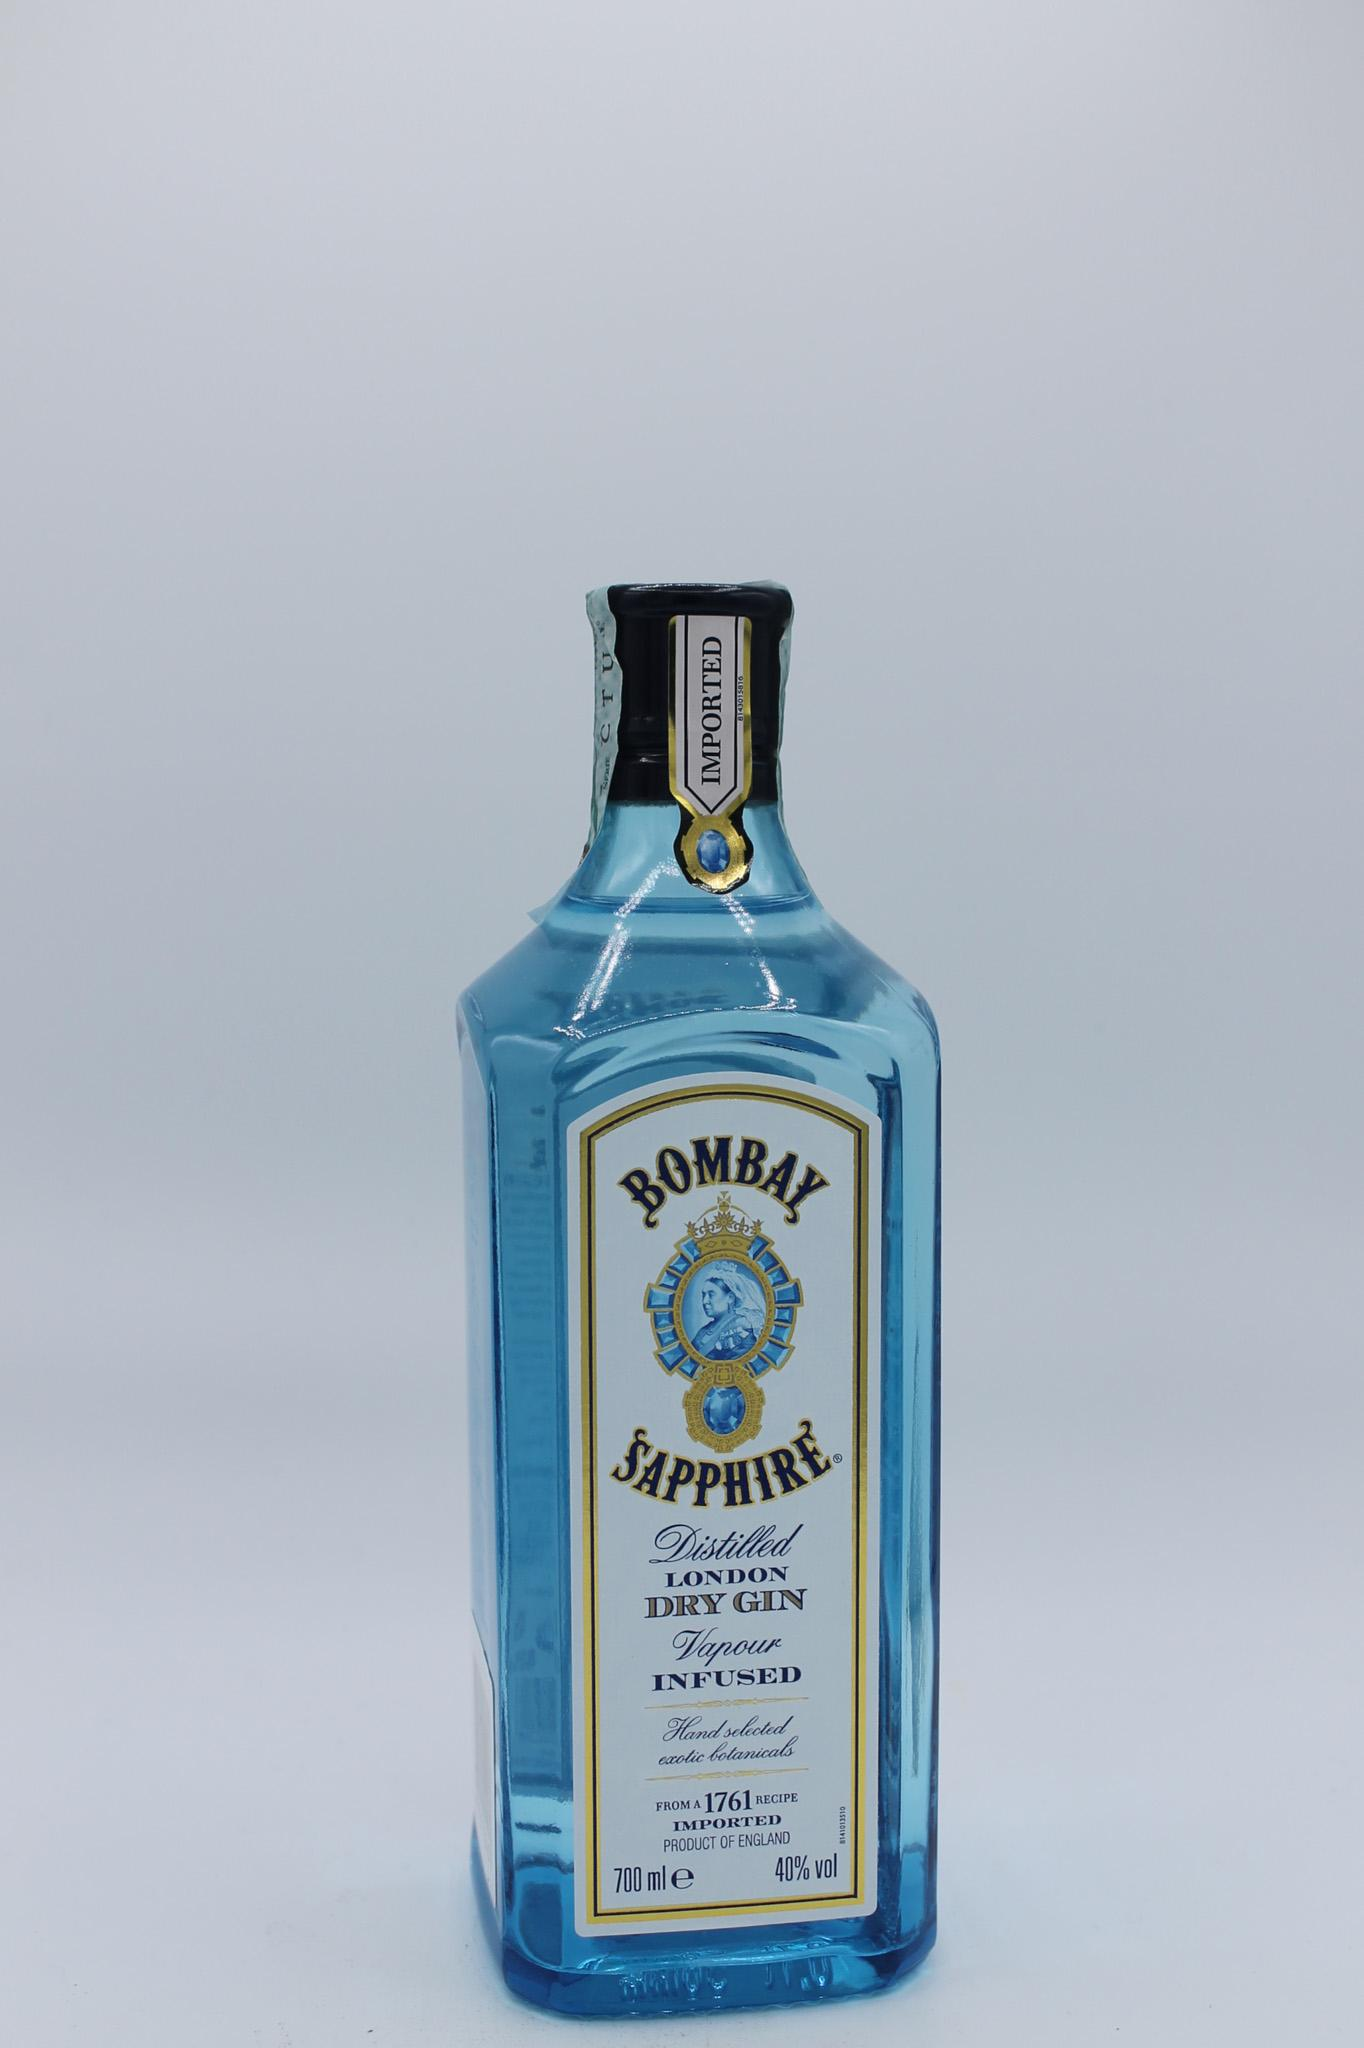 Bacardi gin bombay sapphire 700ml.